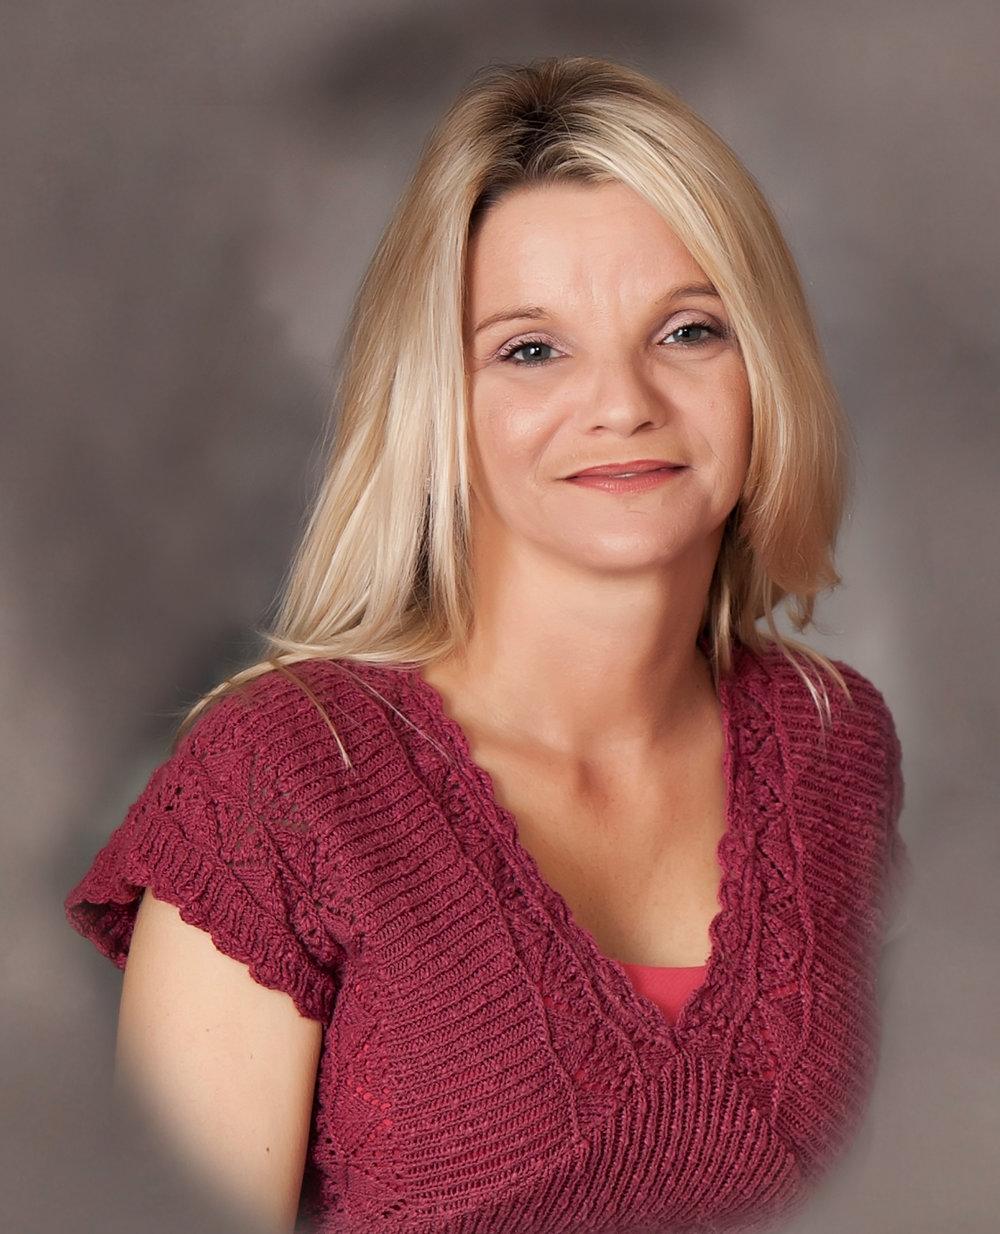 MaryMilton_profile-pic2.jpg